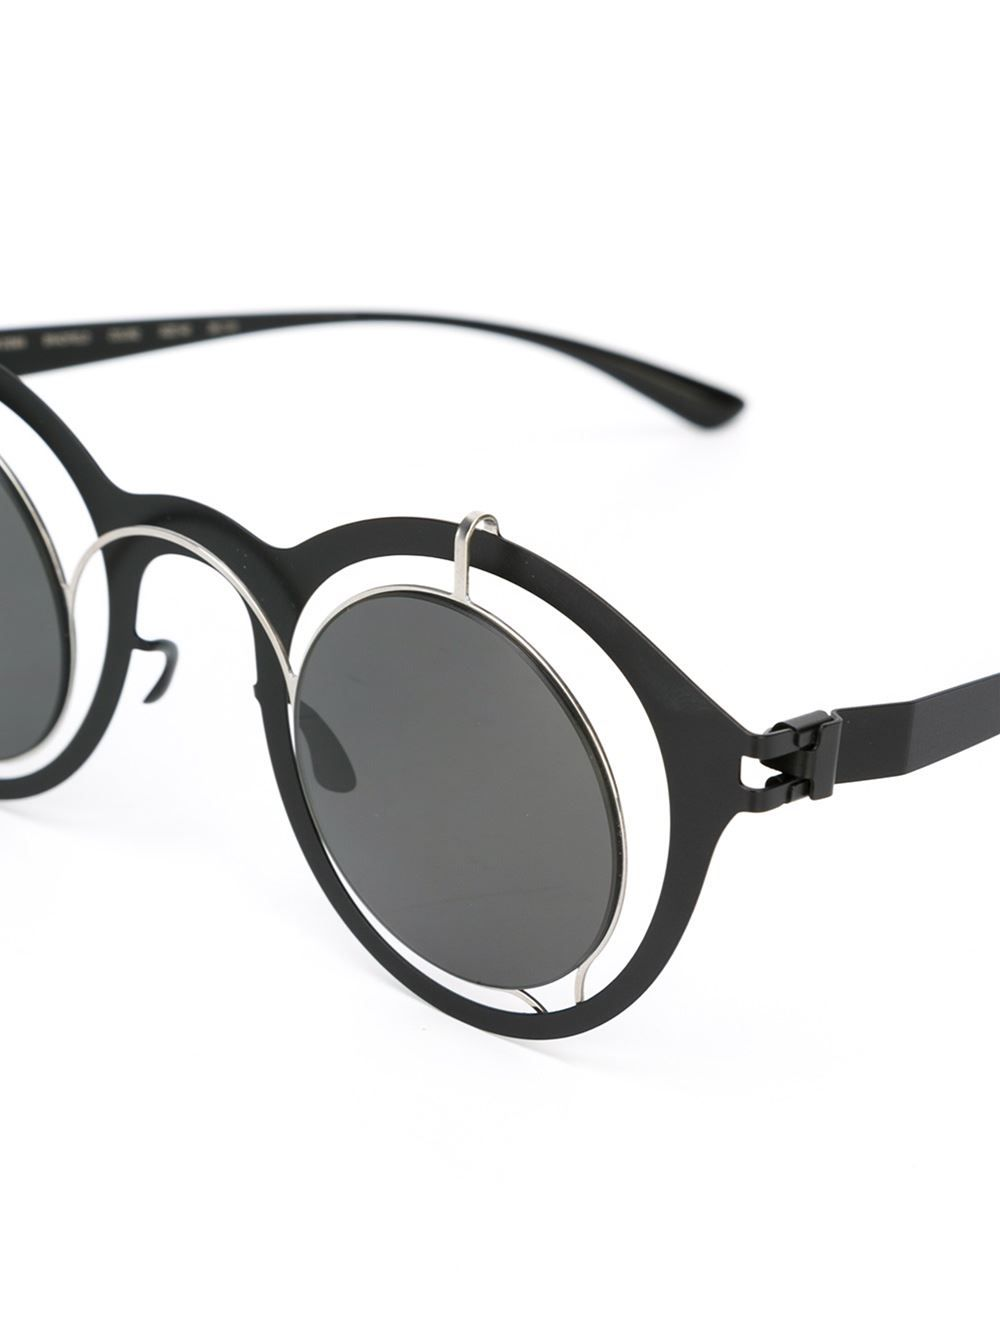 1c439b57f78c9 Mykita Mykita X Damir Doma  bradfield  Sunglasses - Henrik Vibskov Boutique  - Farfetch.com